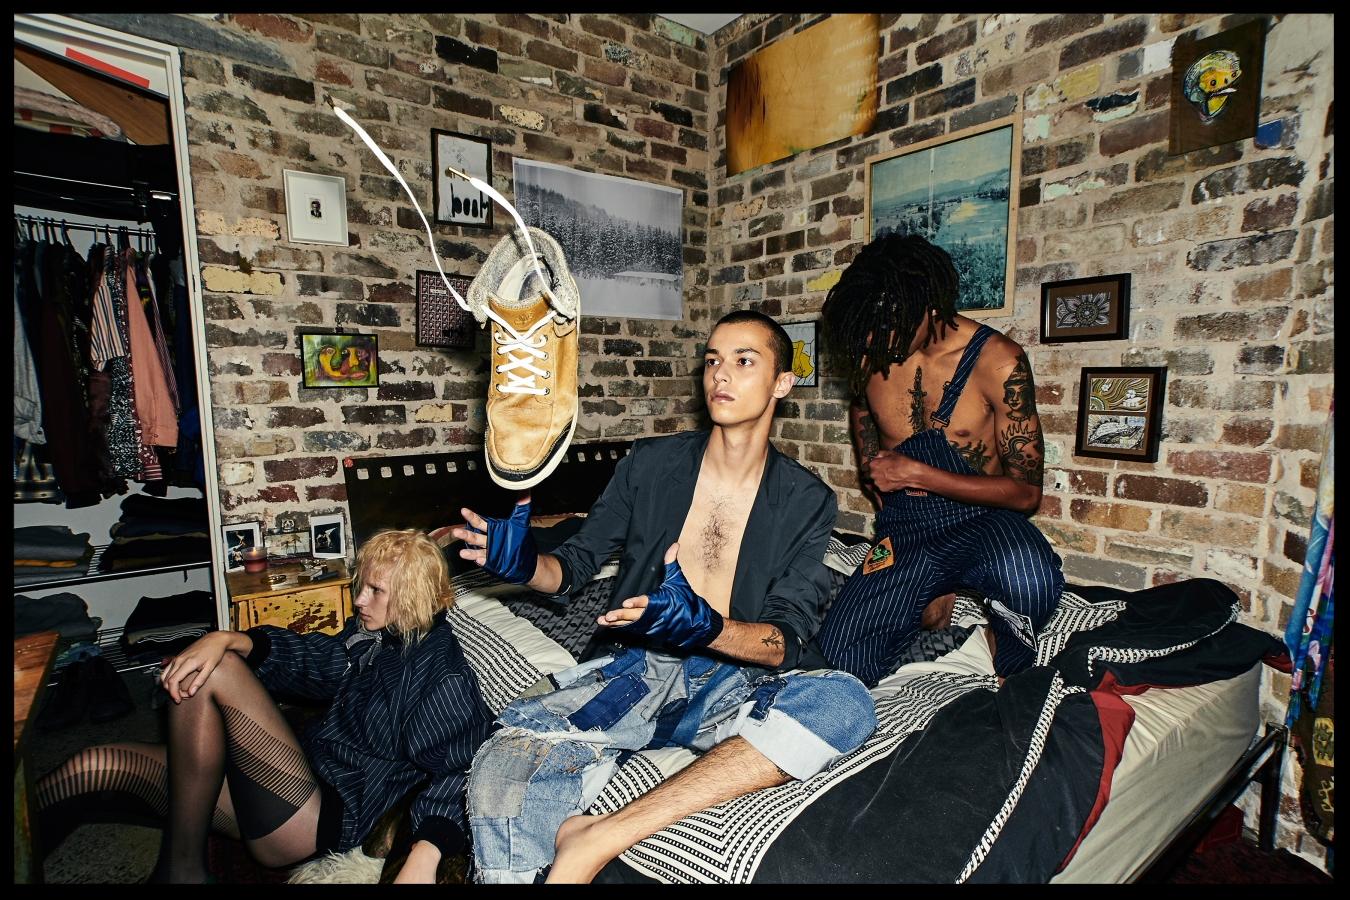 Kane - COS jacket Abbey Walker Designs PantsCOS gloves, Gemma - Emma Mulholland bomber, Yannik - Emma Mulholland overalls